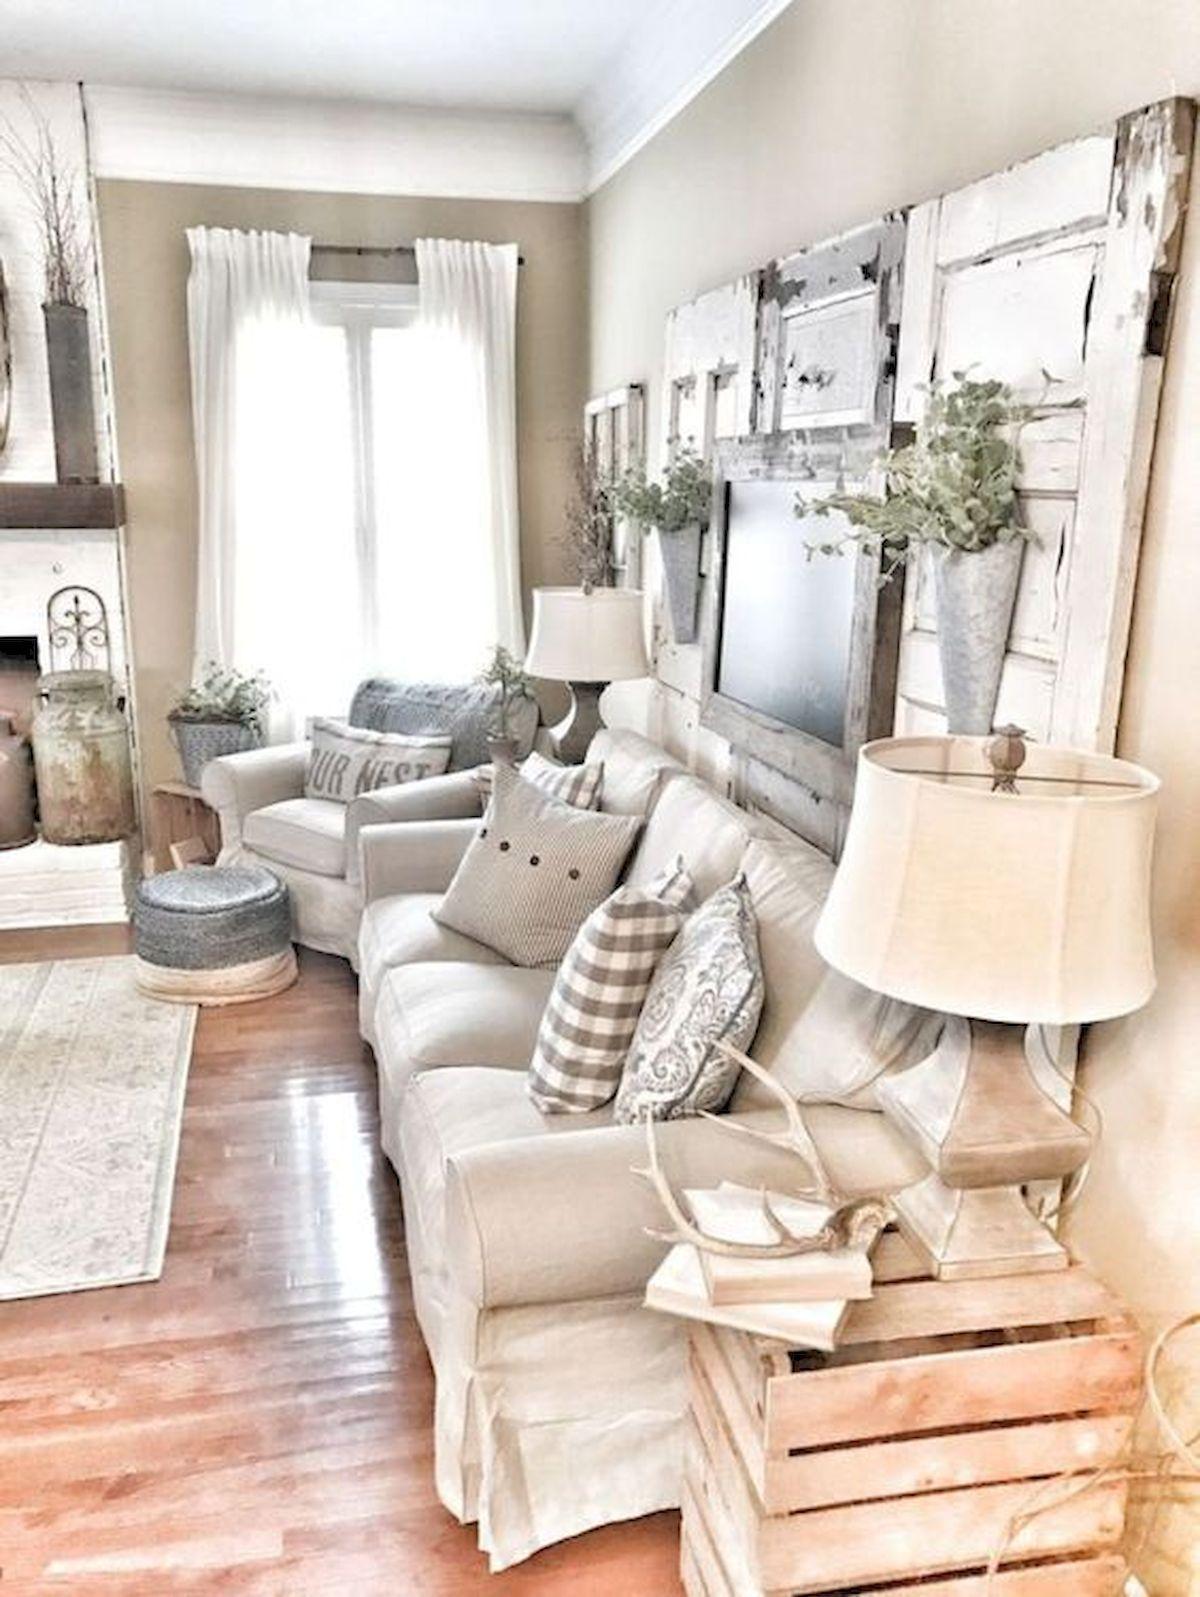 53 Cozy Living Room Decor Ideas To Make Anyone Feels At Home Matchness Com Farmhouse Decor Living Room Modern Farmhouse Living Room Decor Farmhouse Style Living Room